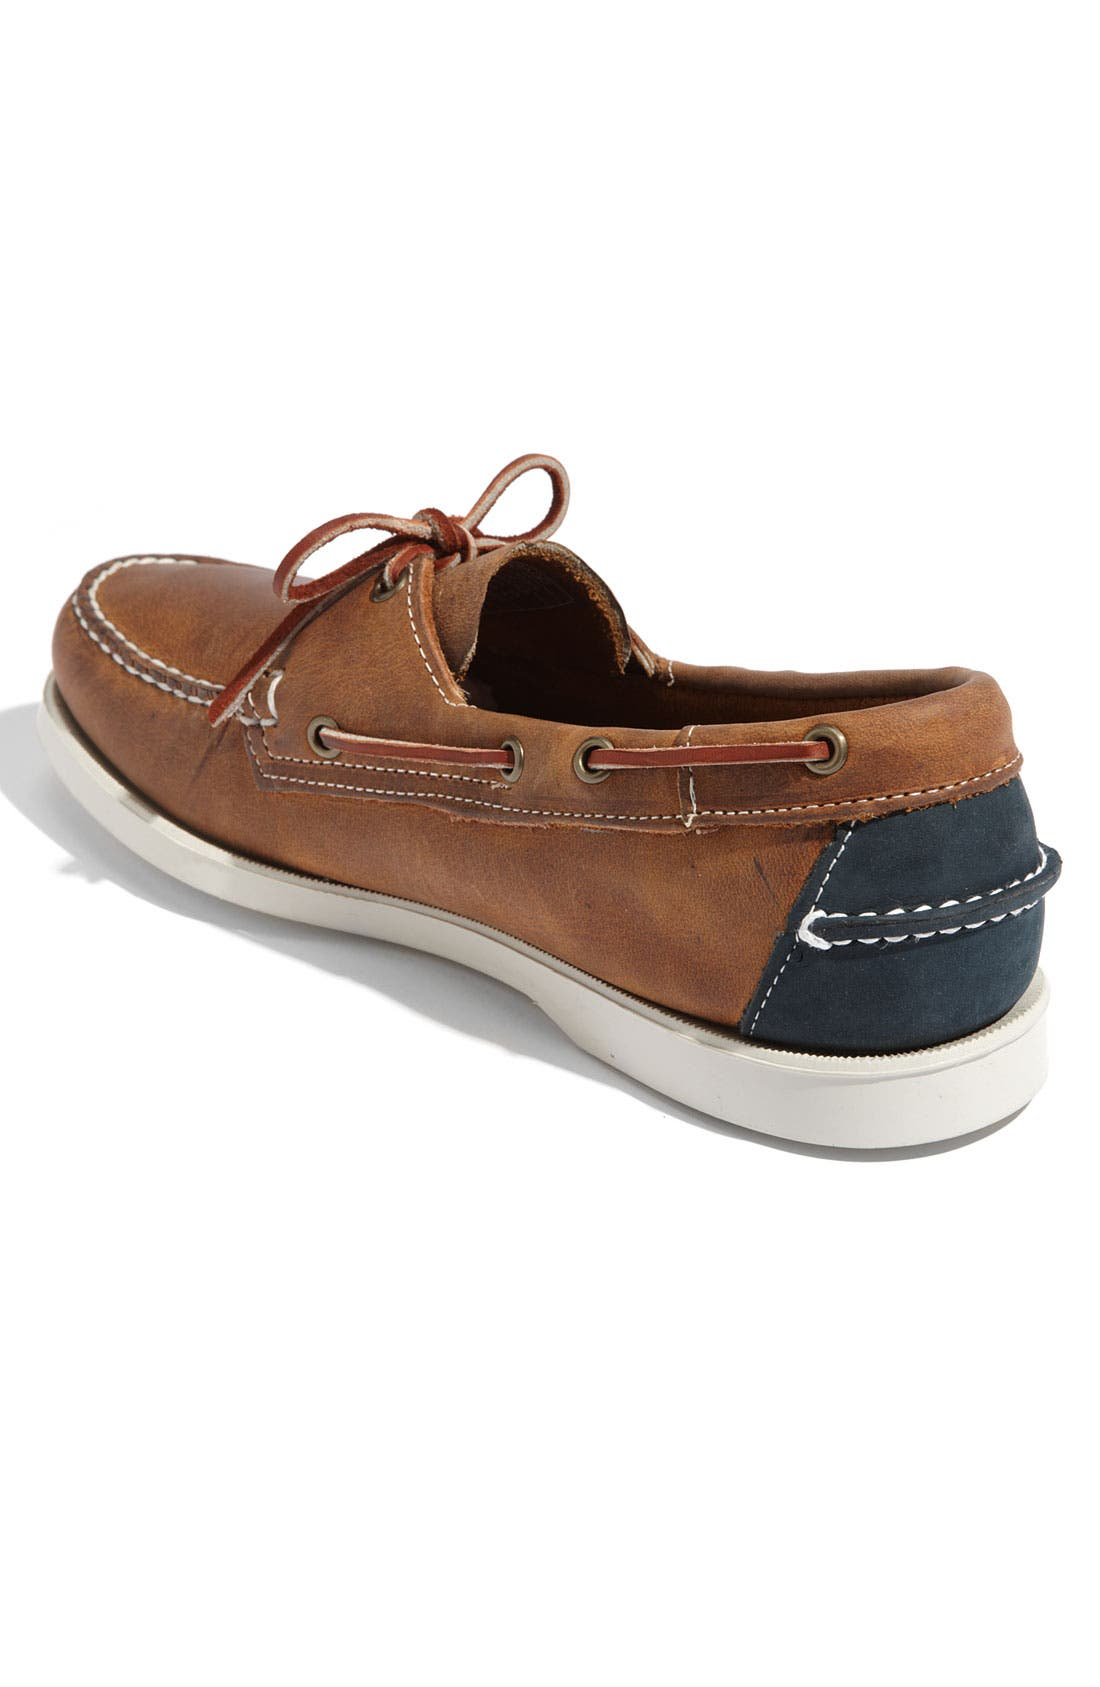 Alternate Image 2  - Sebago 'Spinnaker' Boat Shoe (Men)